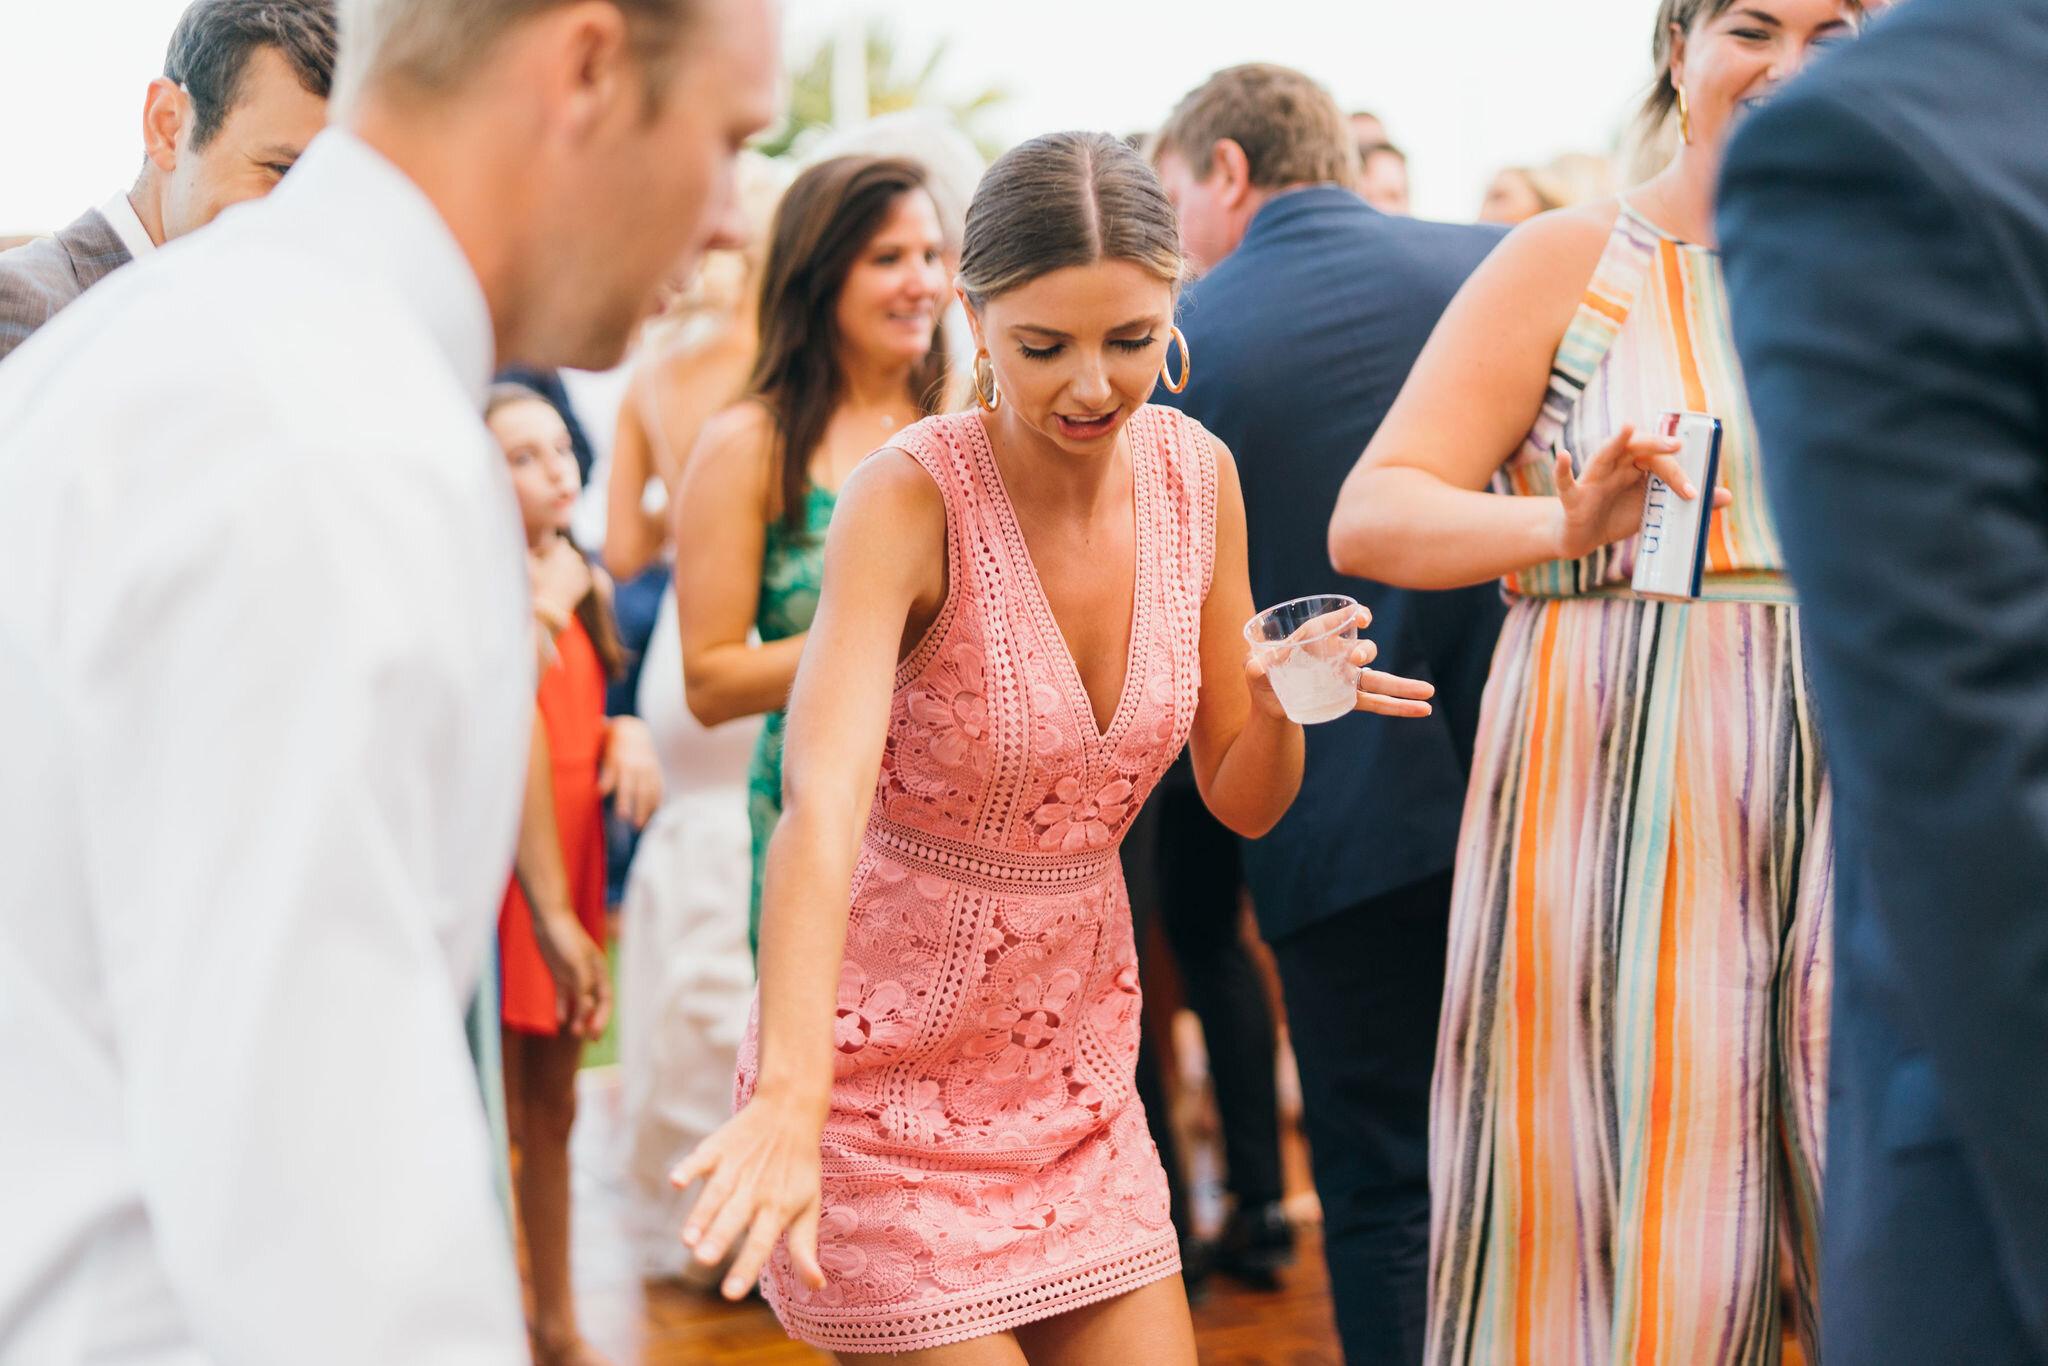 adamson-house-wedding-photography-173.jpg